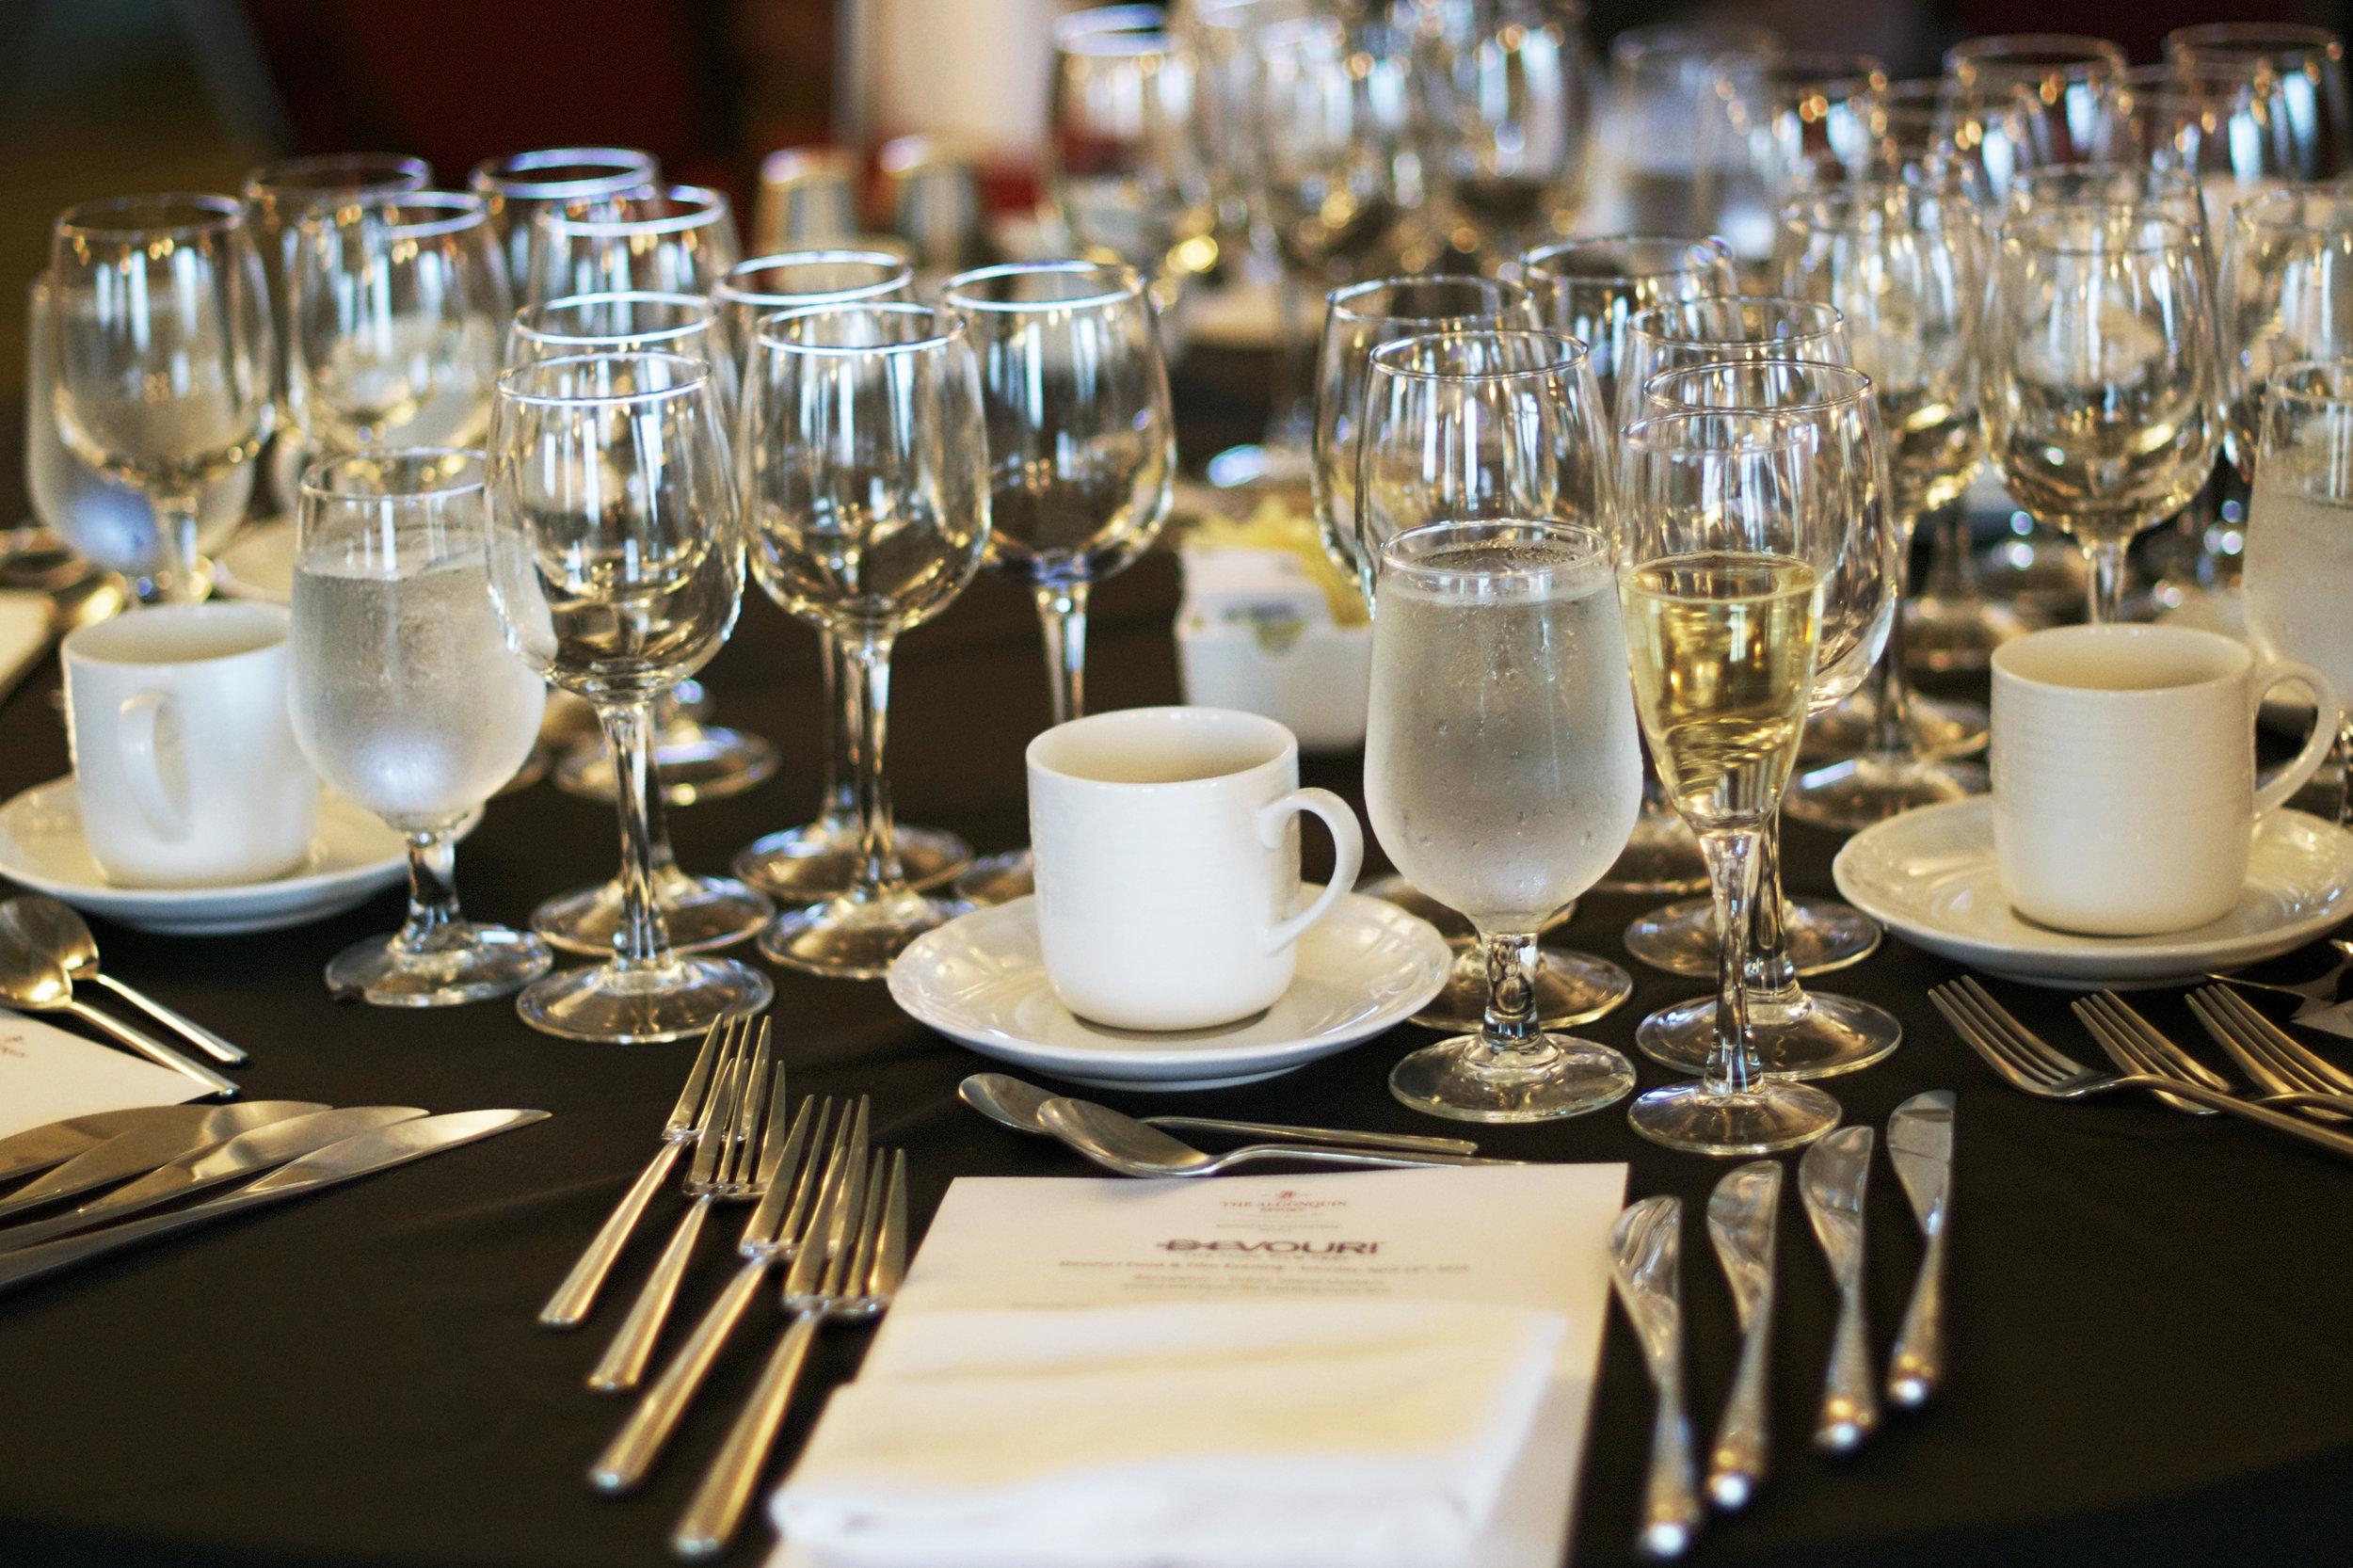 table-setting-5-course-dinner.jpg